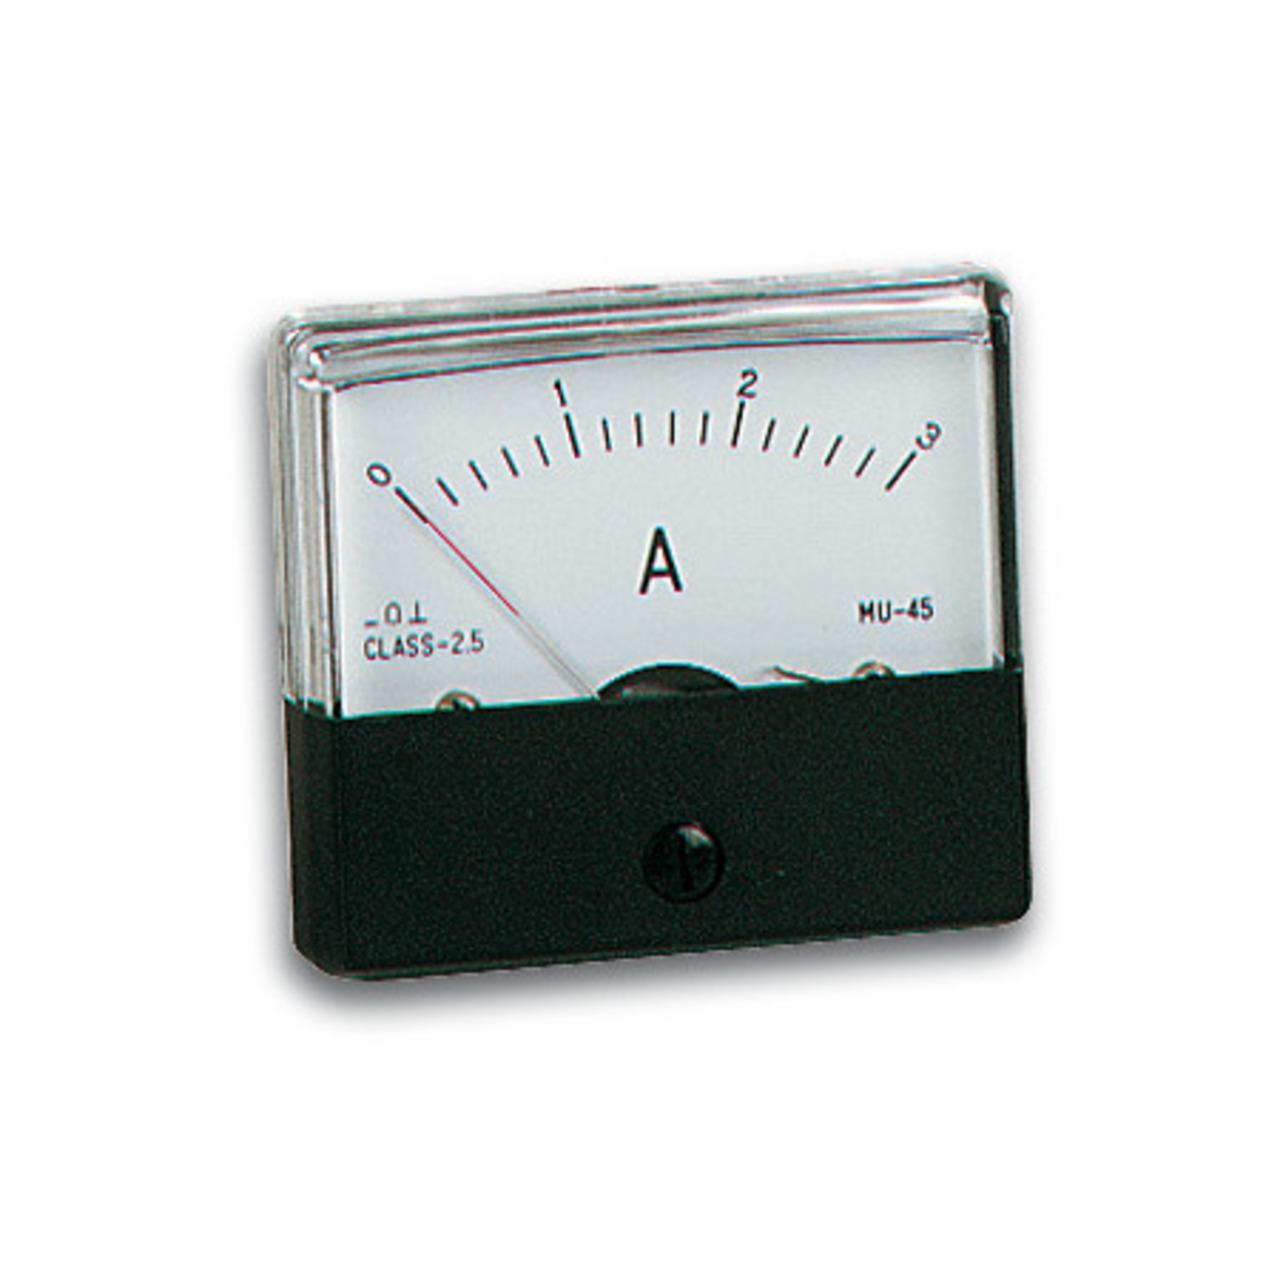 Einbaumessmodul analog Strom  DC 3 A/ 60 x 47 mm